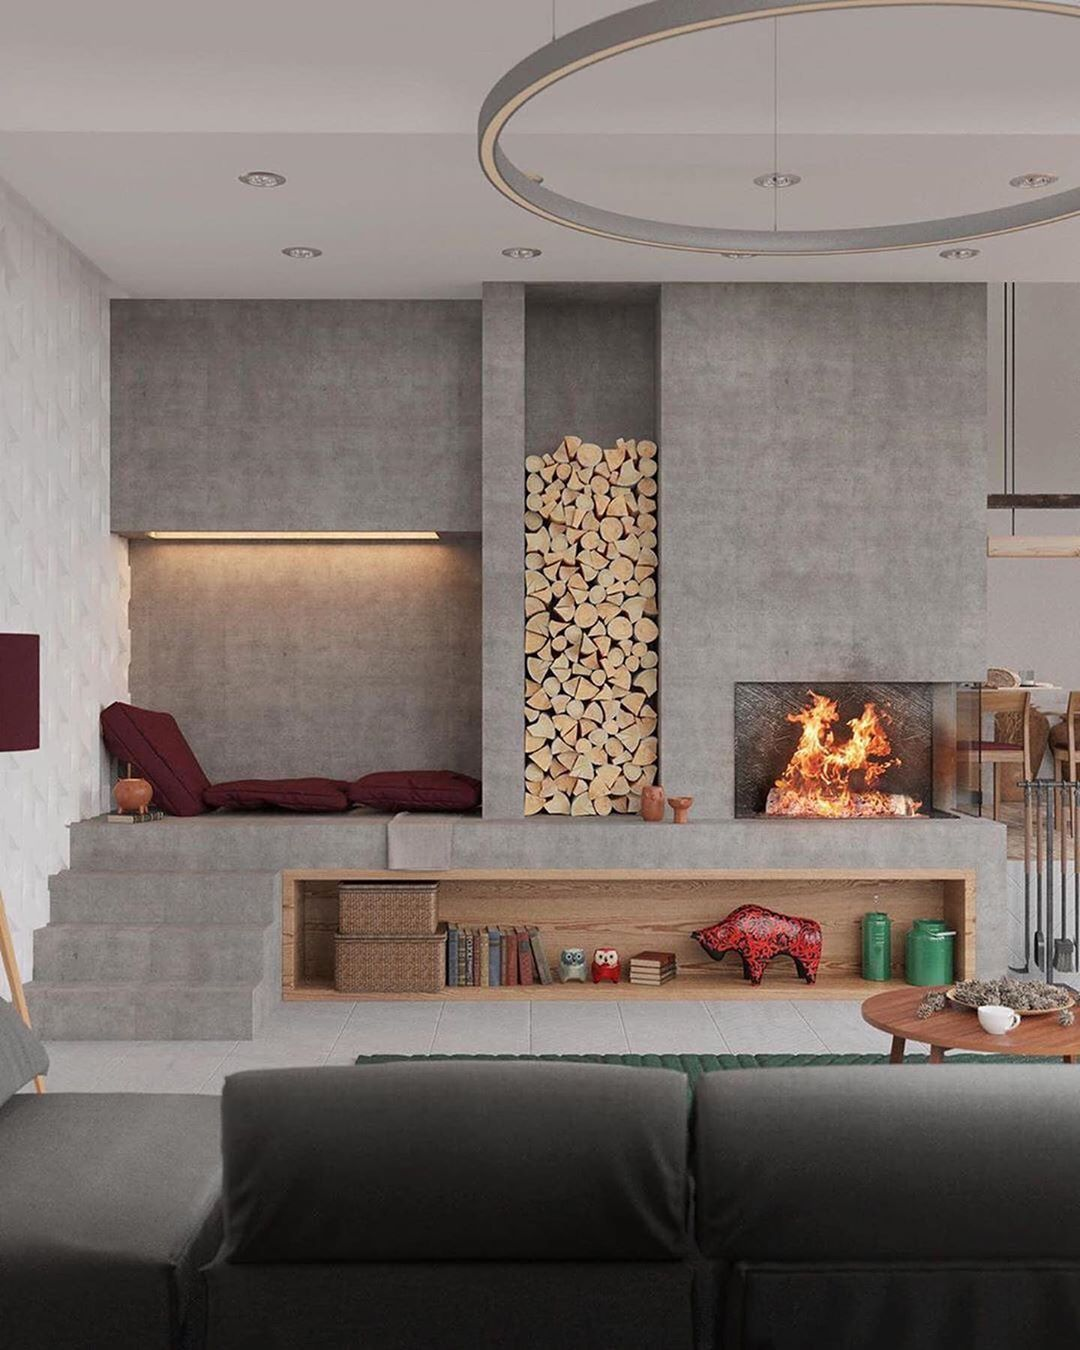 Best Furniture Shop In East Delhi Interior Design Institute Modern House Design Home Decor Styles